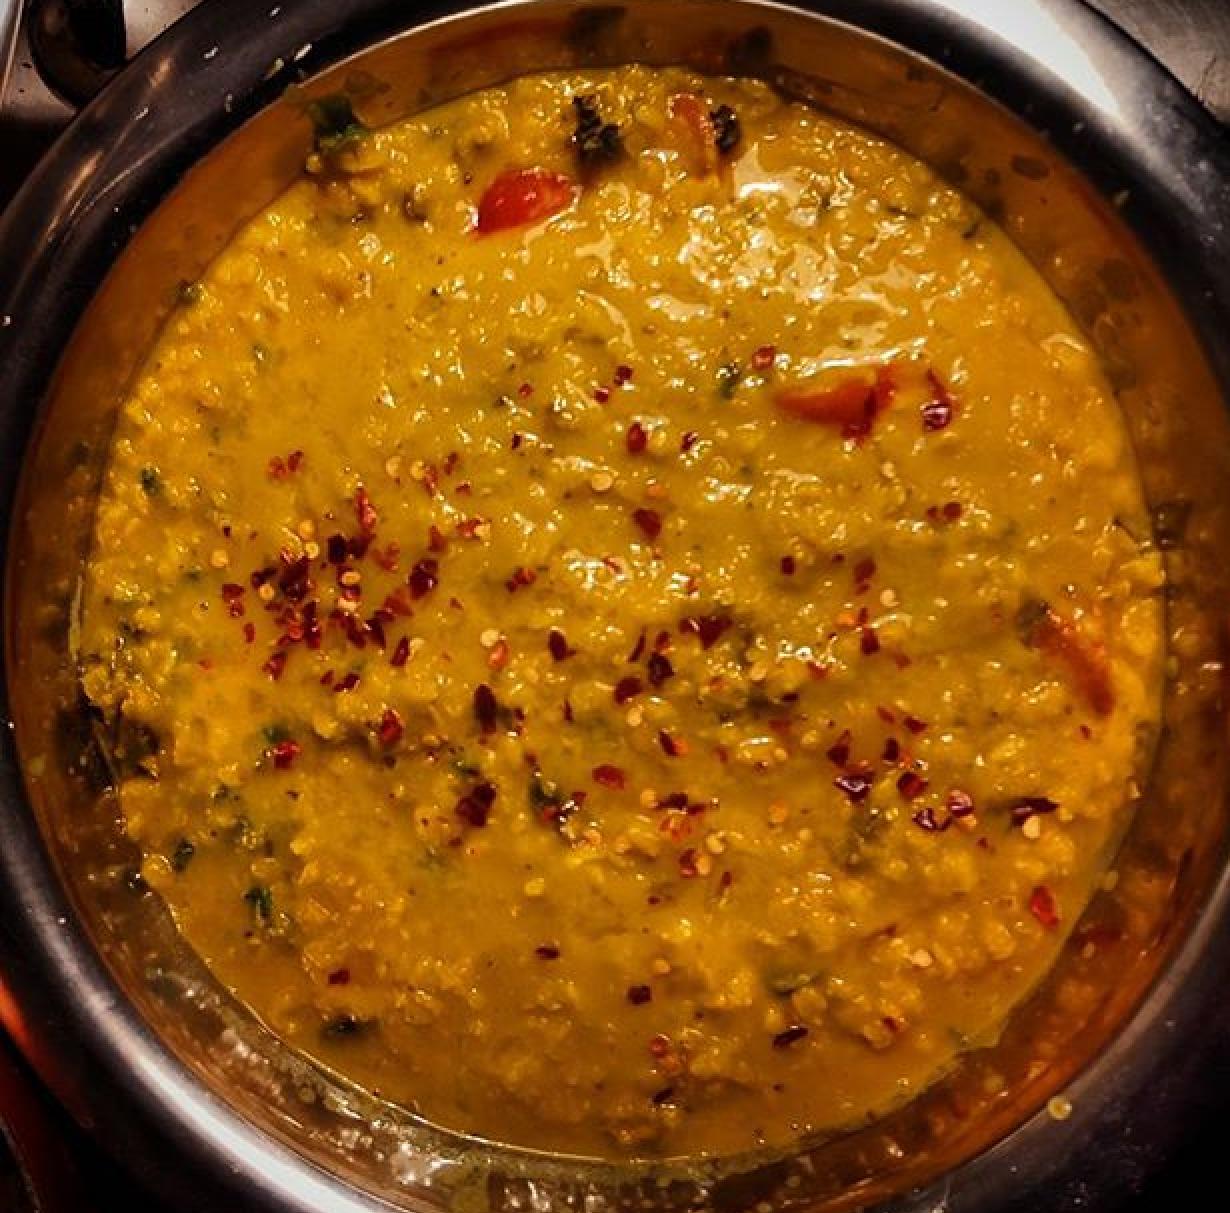 Tarka Daal recipe by Jack Monroe